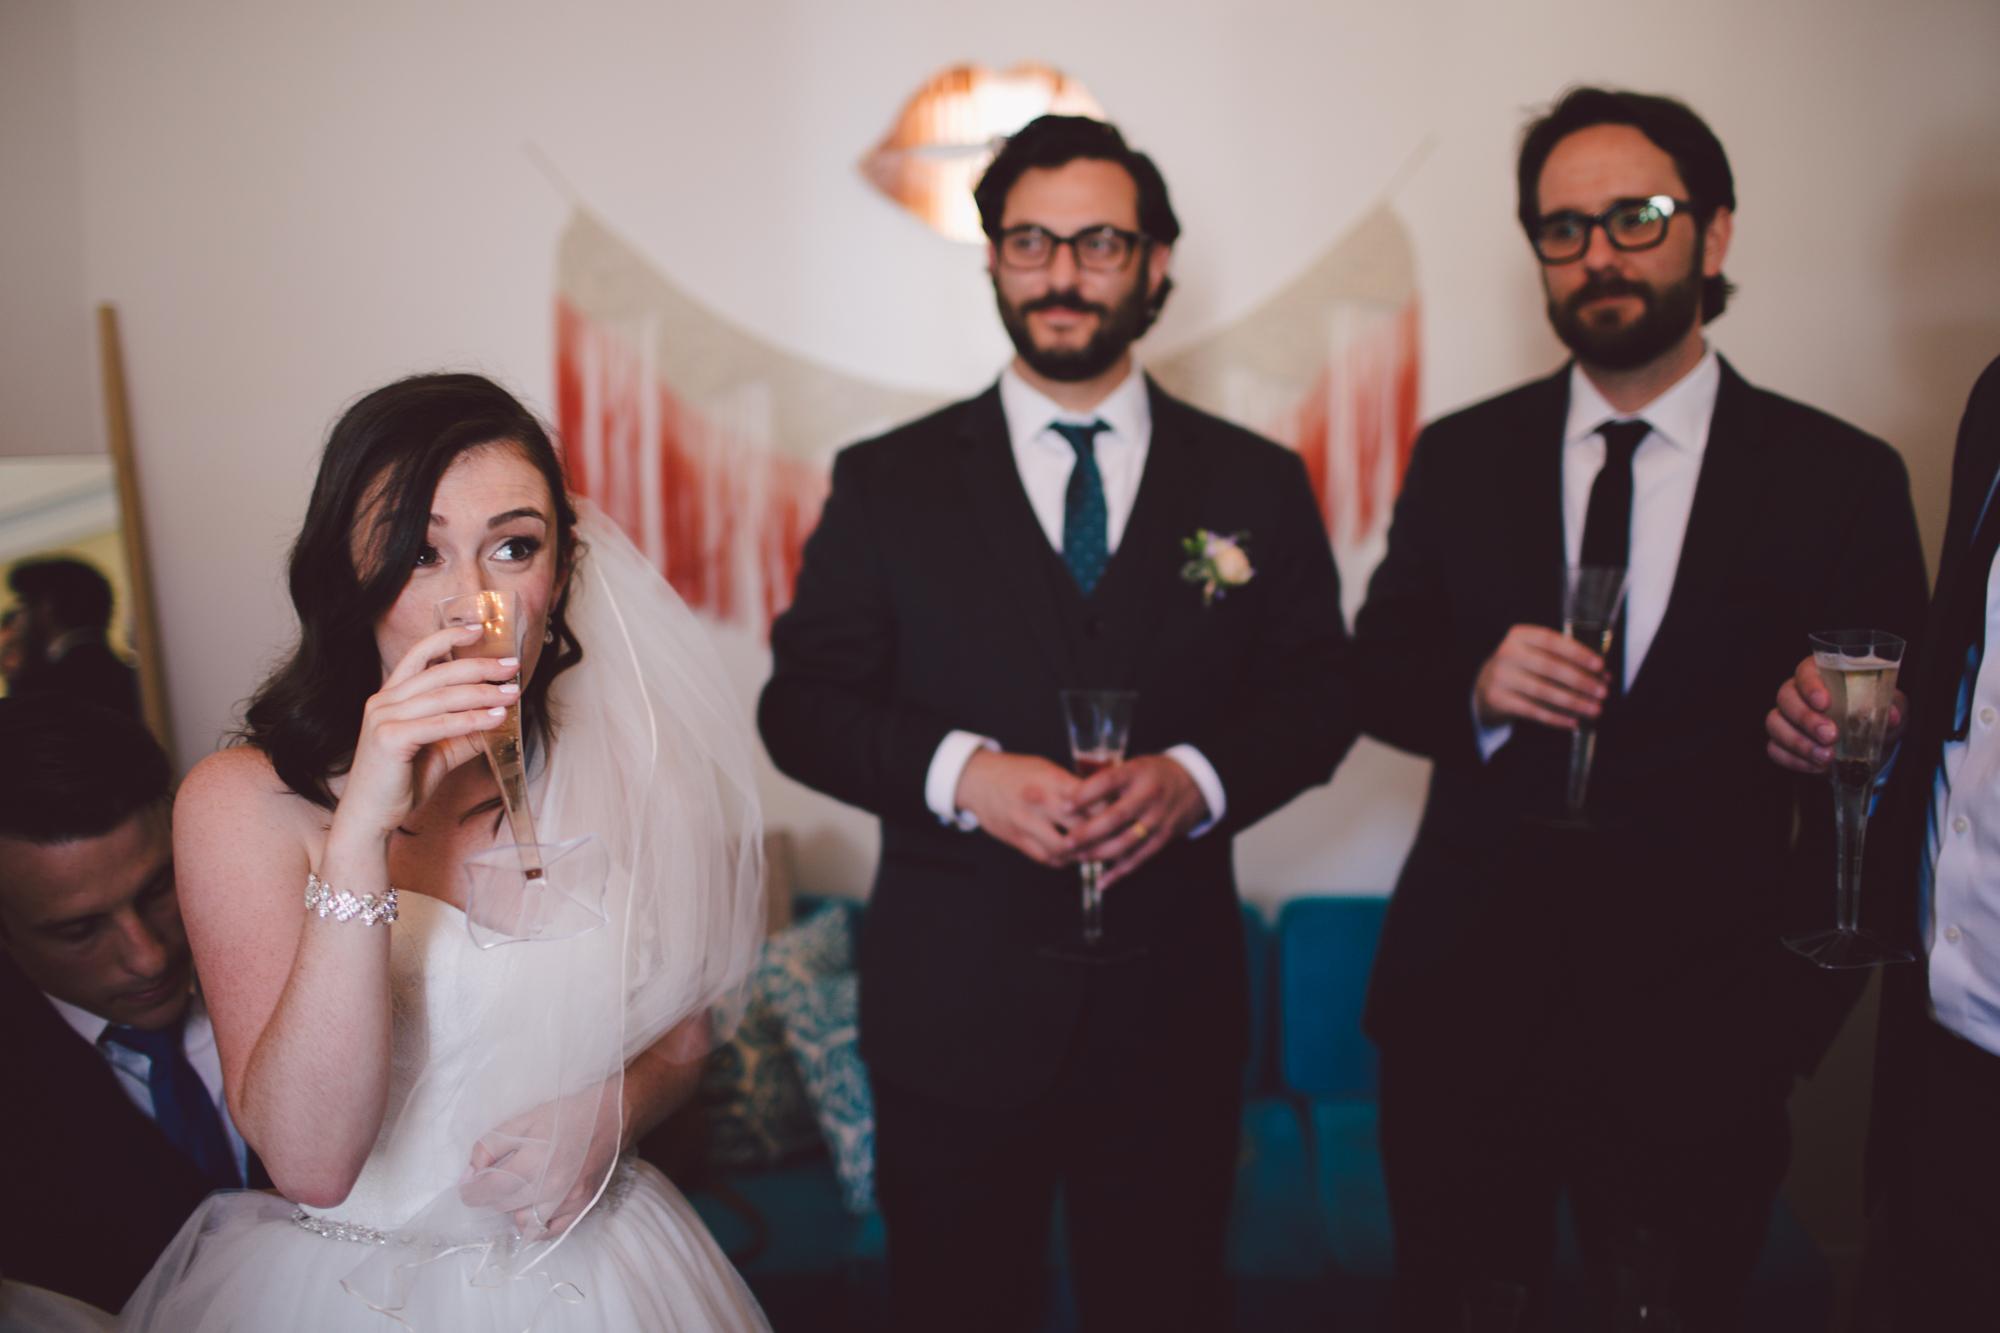 documentary-lifestyle-los angeles-wedding photographer-ruby street-los angeles-california wedding venue